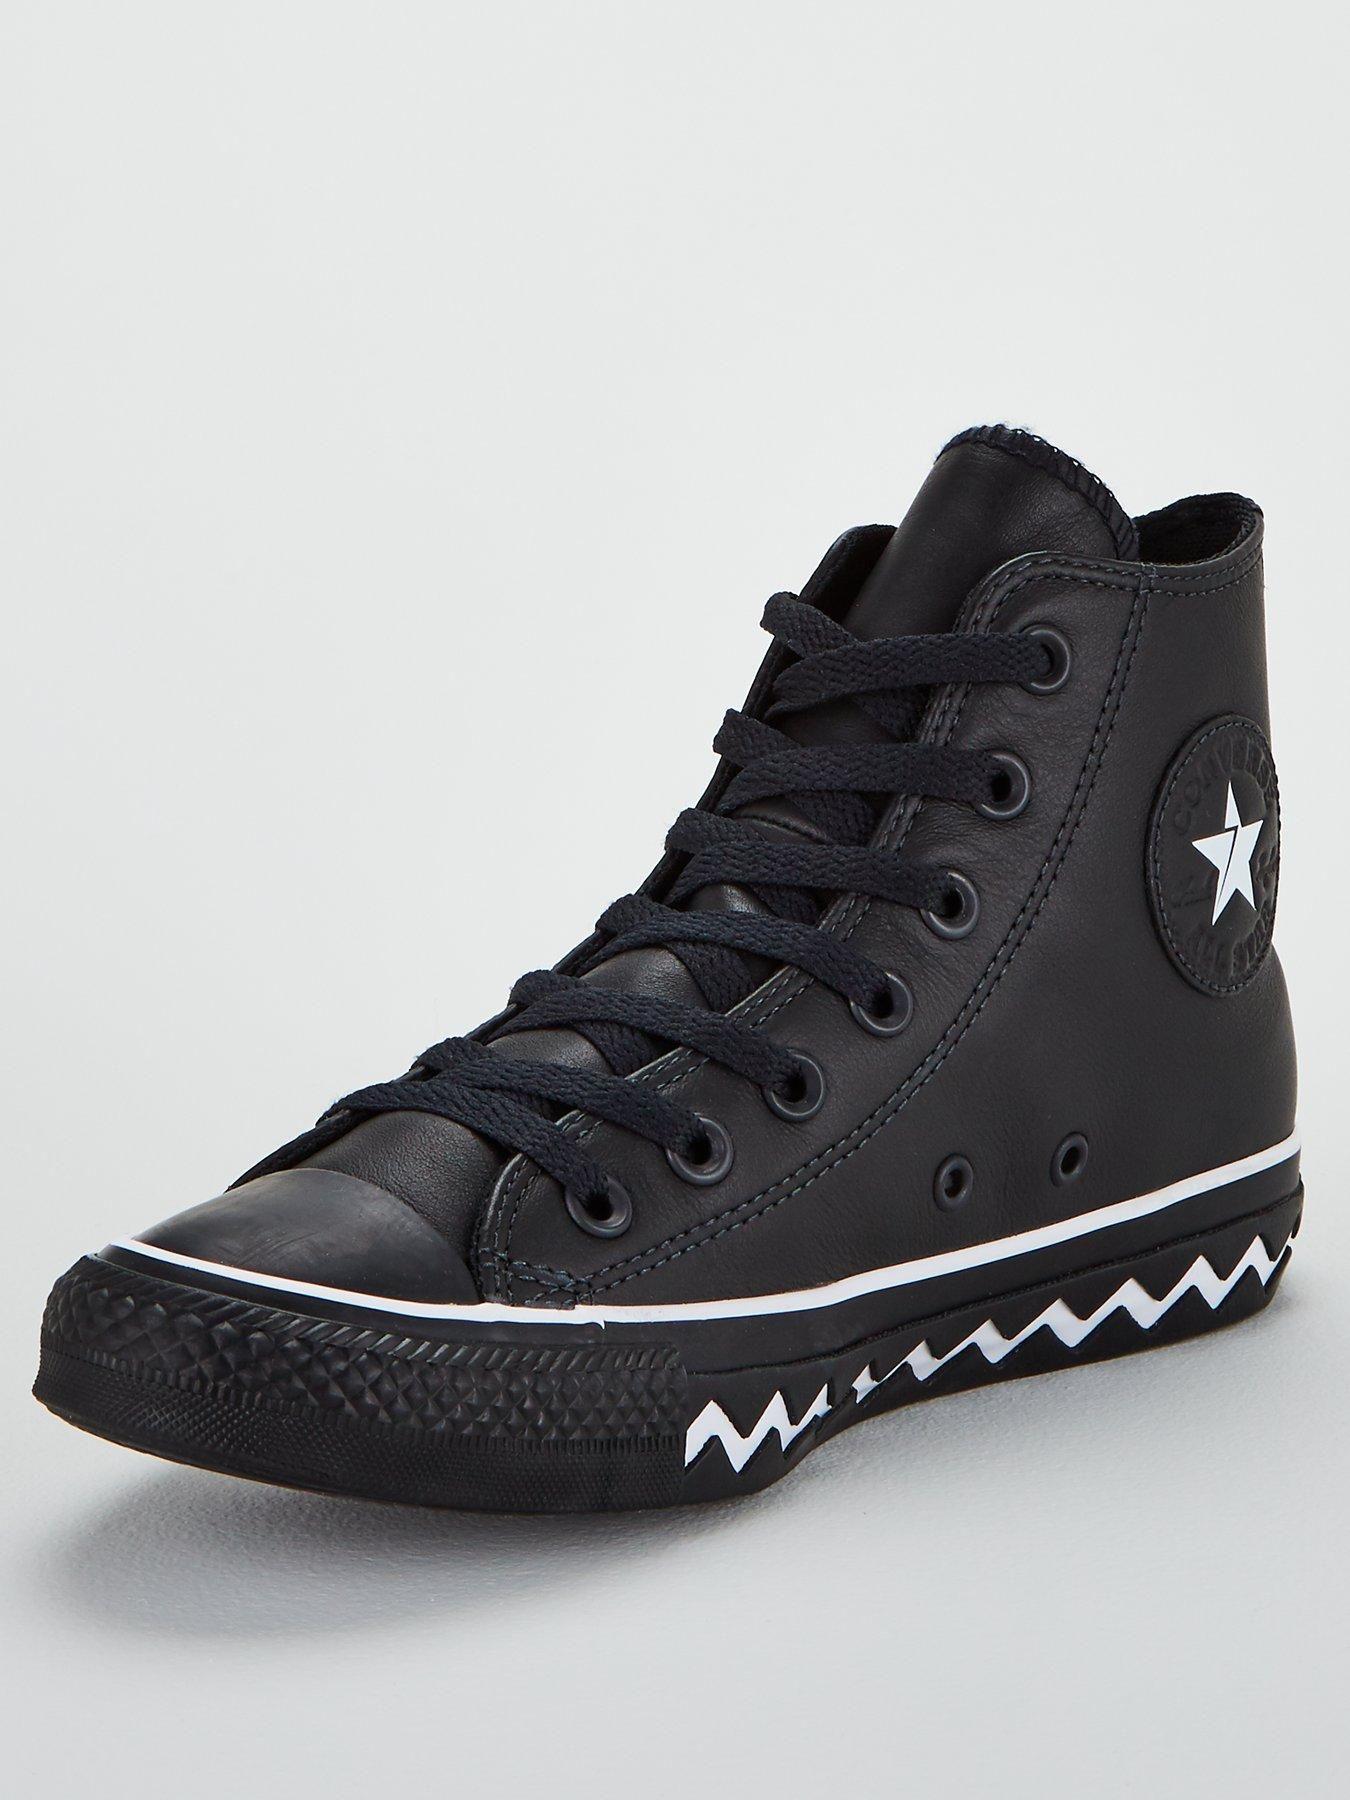 Converse Chuck Taylor All Star Vltg Leather High Top Black